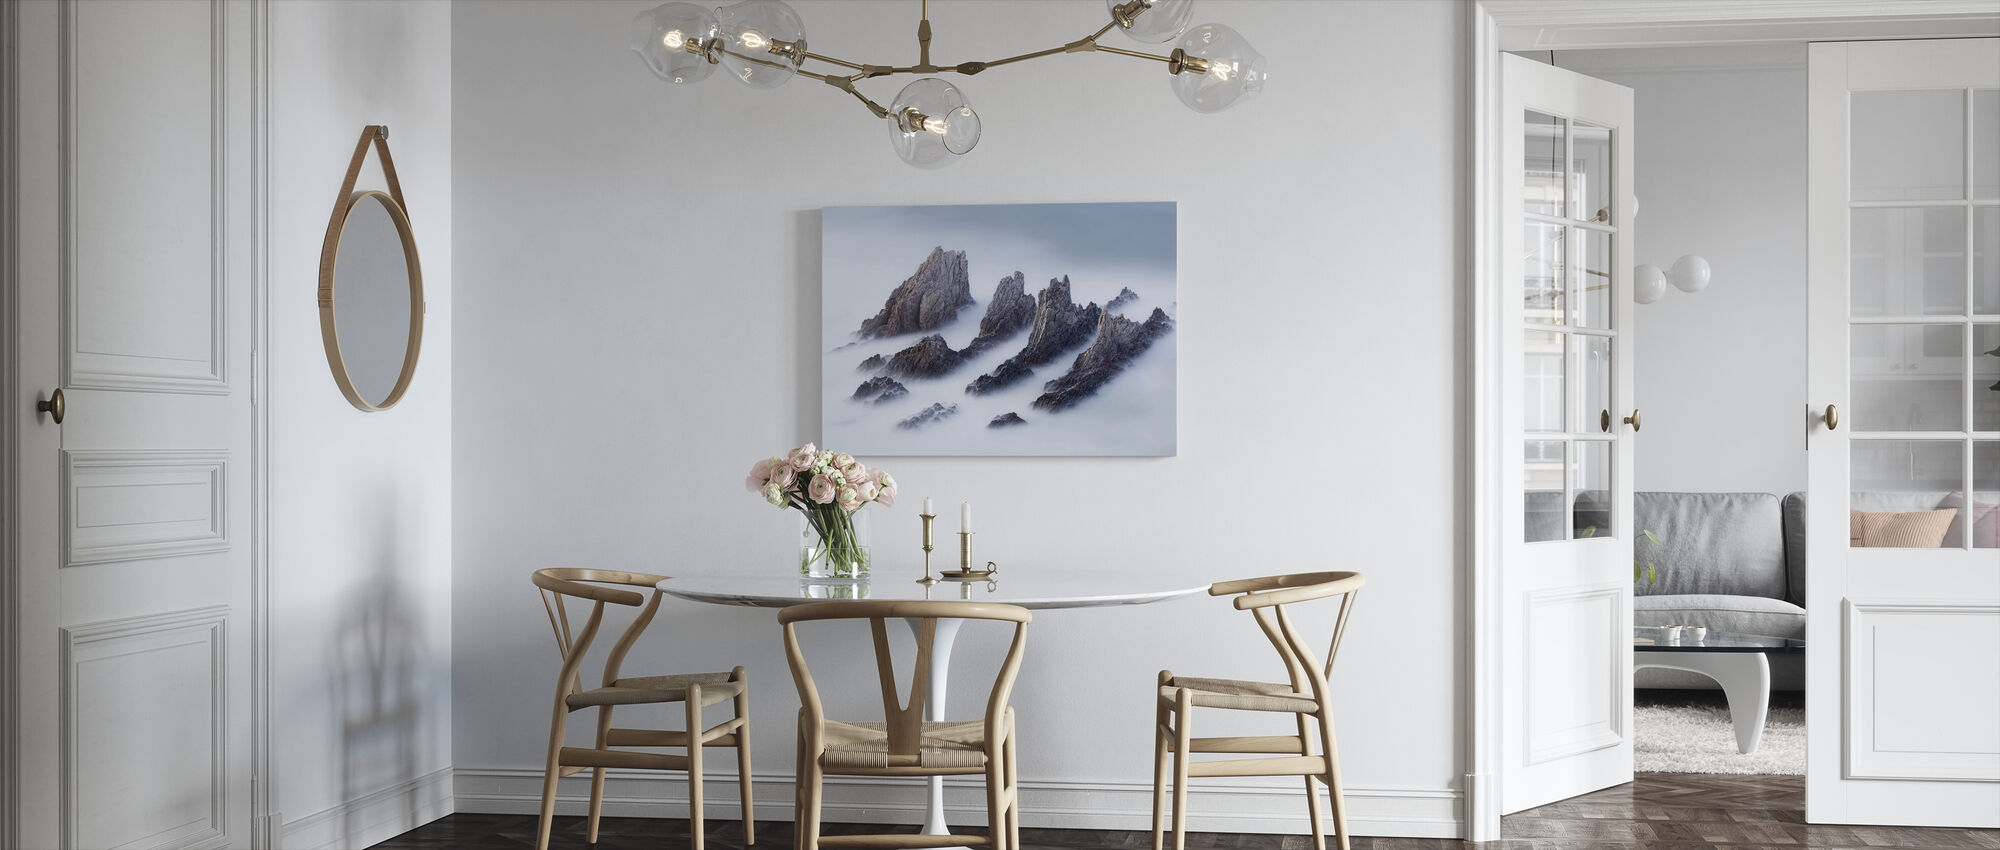 Crests and Valleys - Canvas print - Kitchen